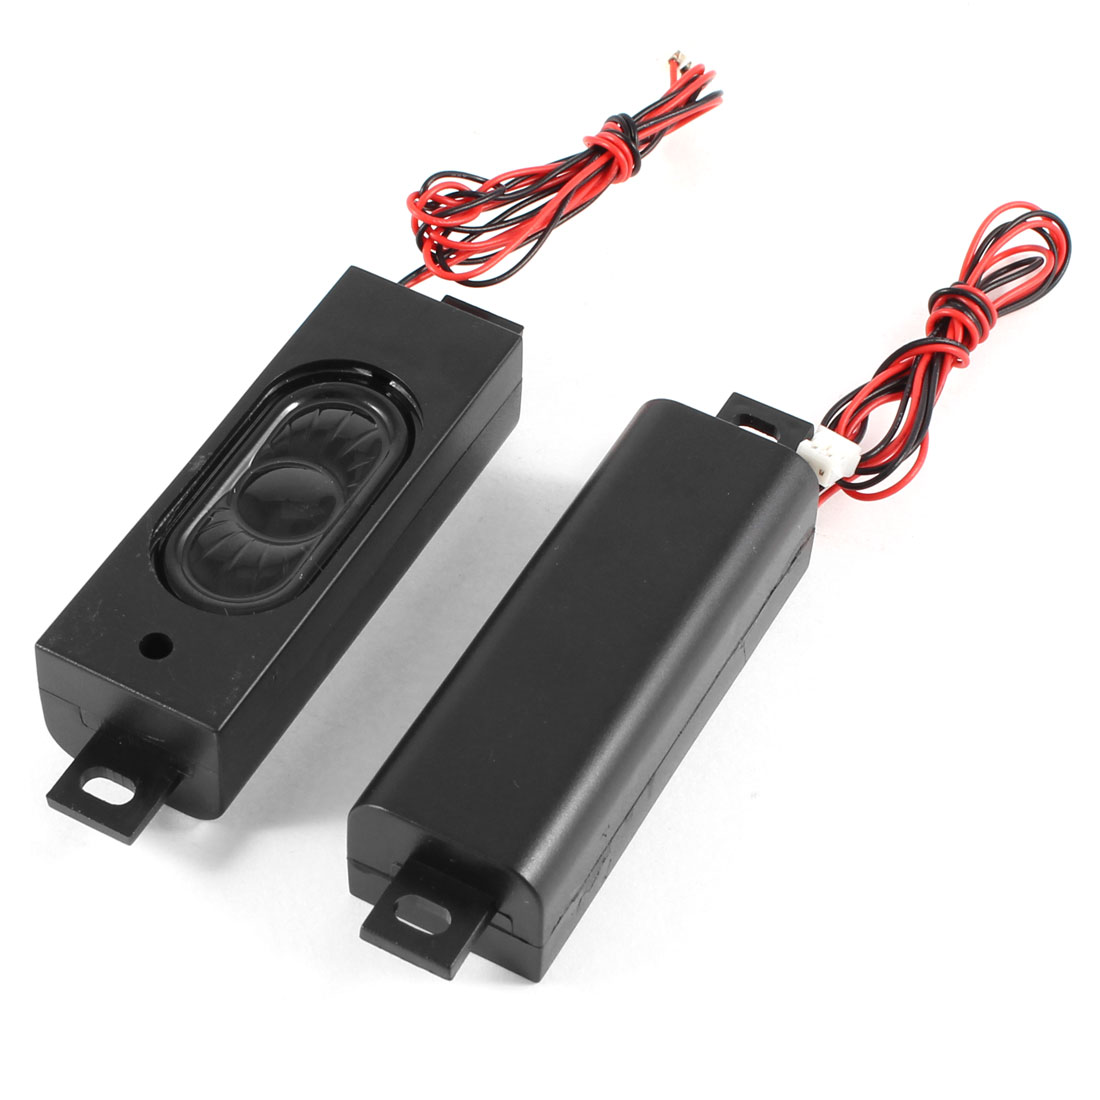 2 Pcs Black Plastic Shell 2 Leads Wires Audio Speaker Trumpet Loudspeaker 8 Ohm 2W